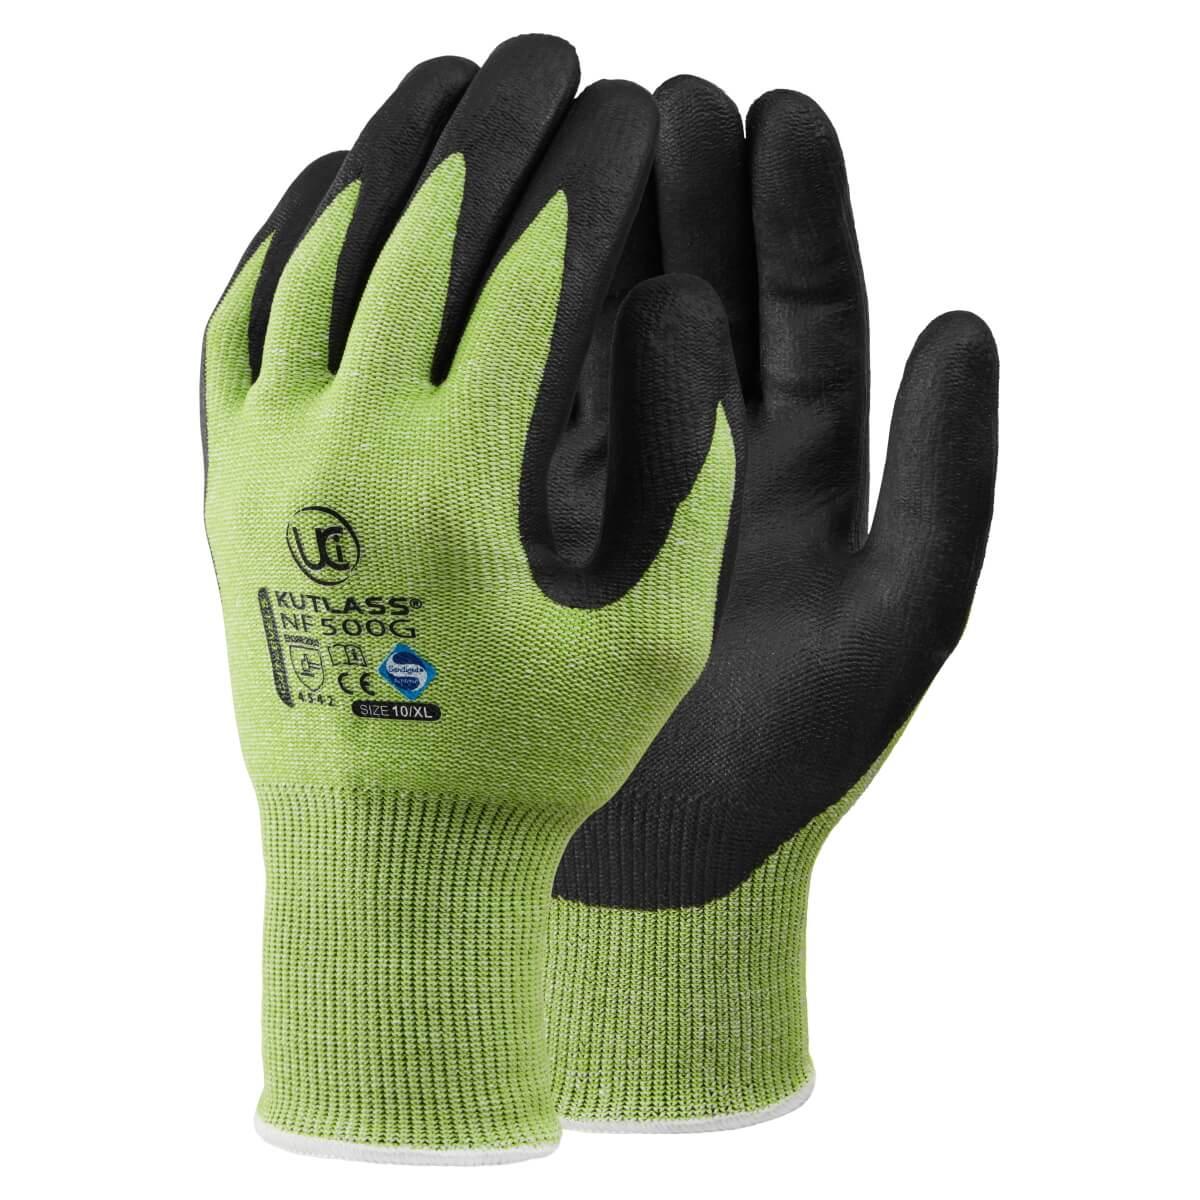 GL4143 Kutlass Cut Level 5 Black Nitrile Palm Coated Gloves